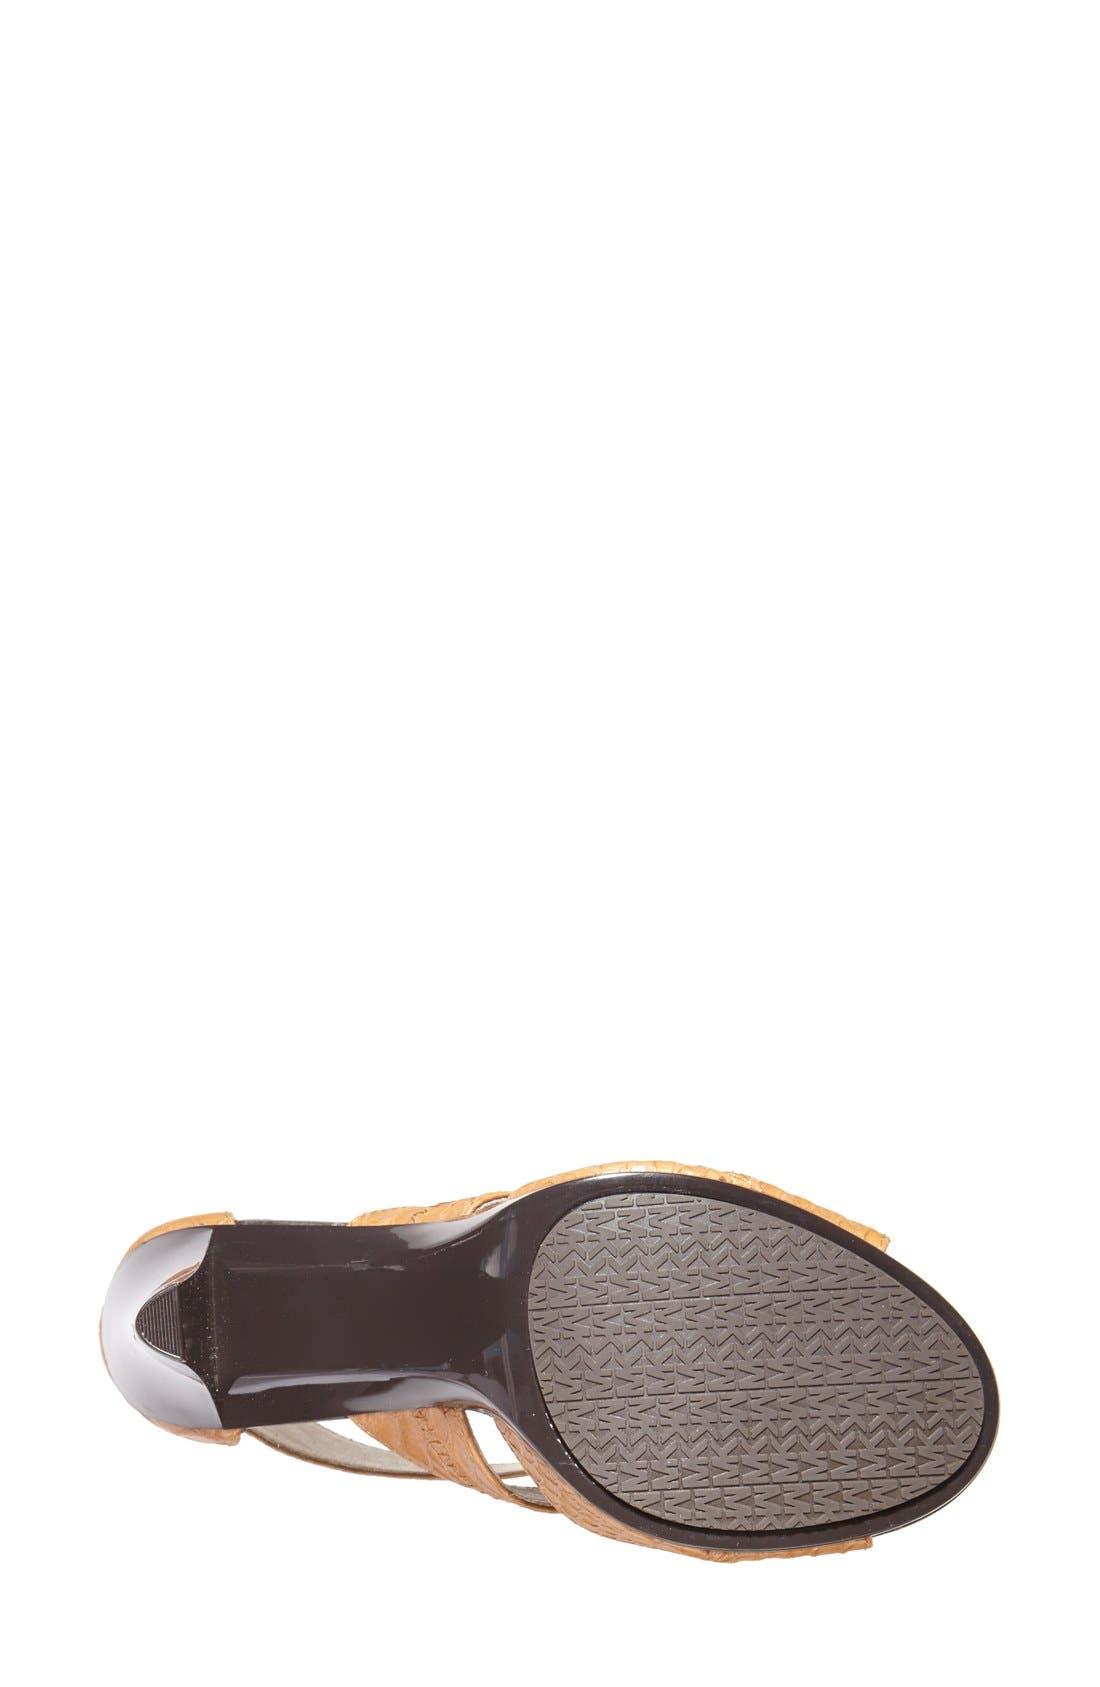 'Berkley' T-Strap Sandal,                             Alternate thumbnail 45, color,